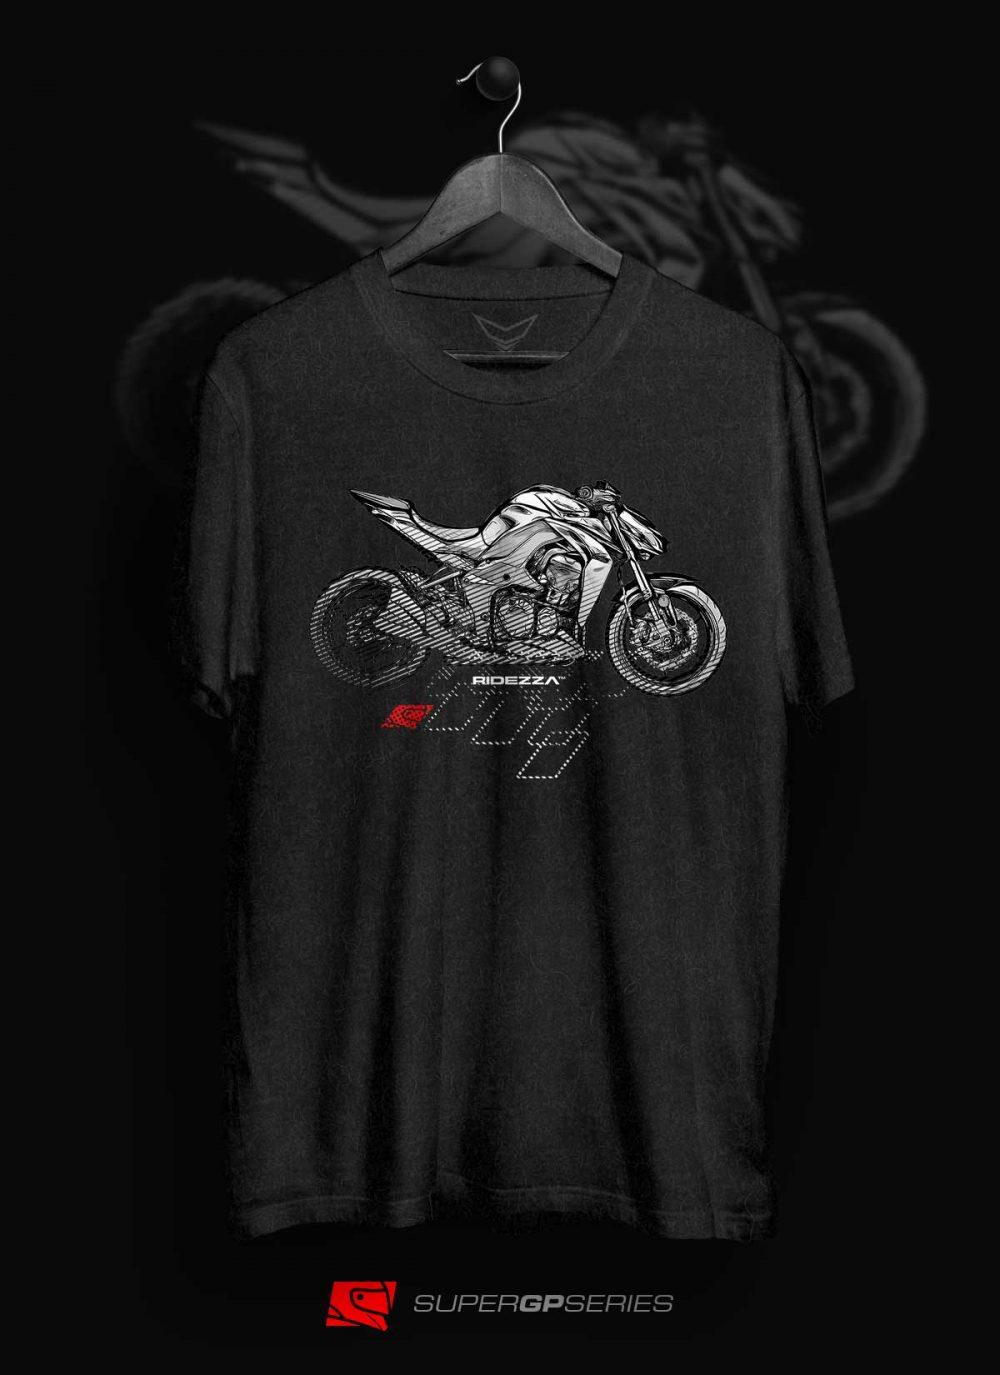 Ridezza Z1000 SuperGP Series T-Shirt